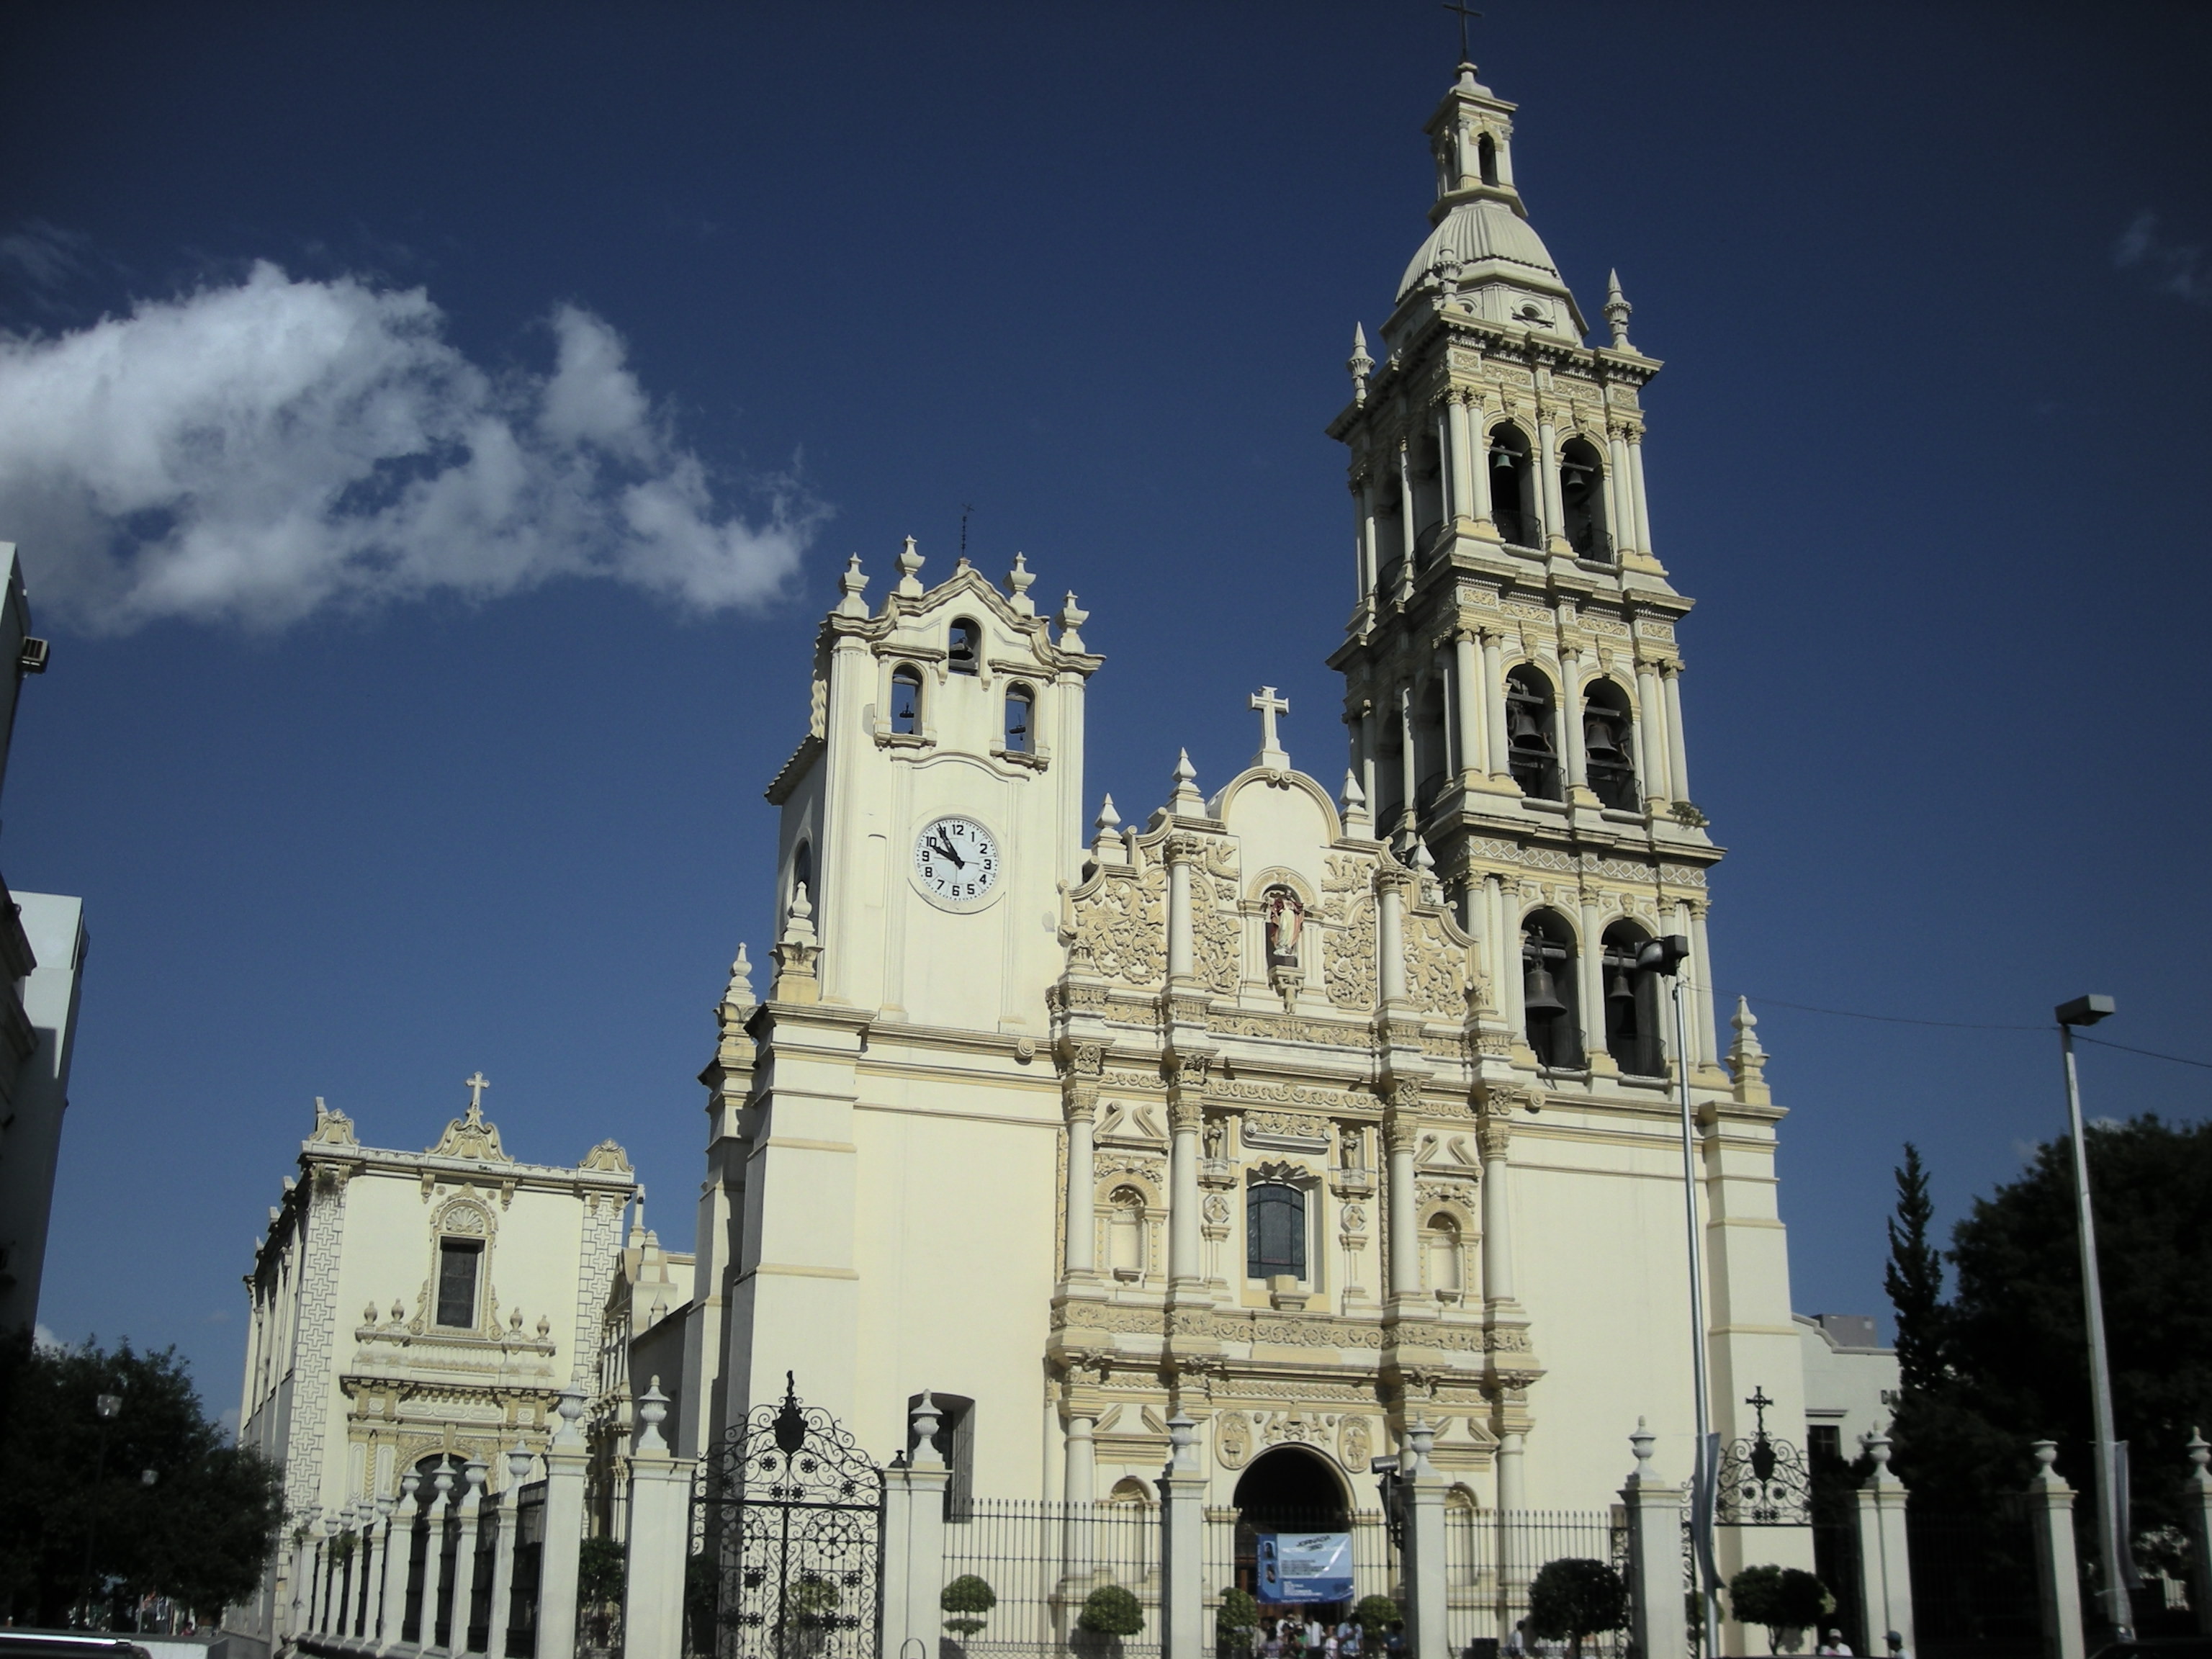 Catedral metropolitana de Monterrey - Wikipedia, la enciclopedia libre